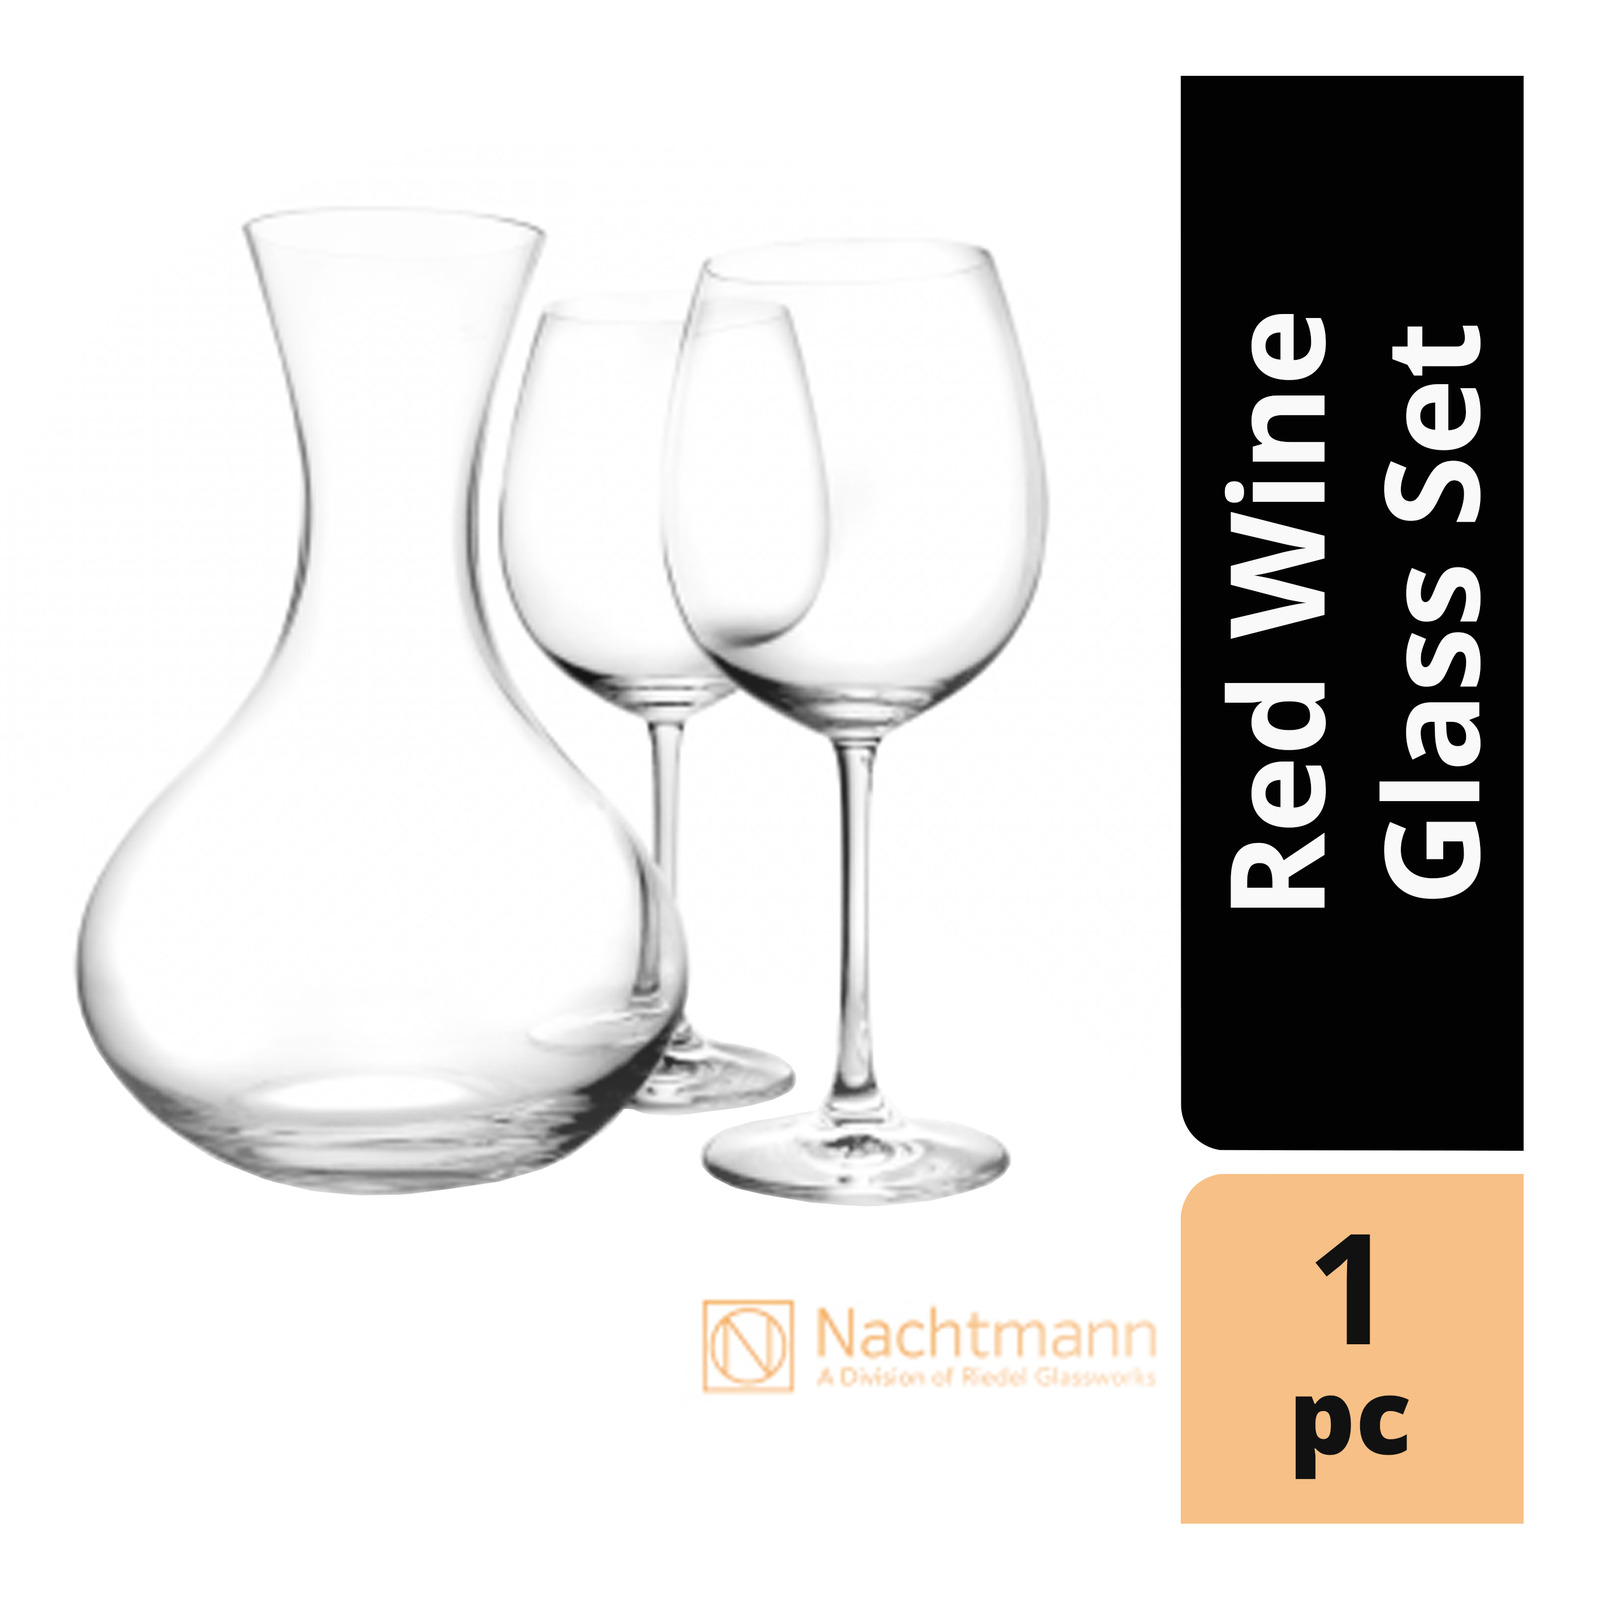 Nacthmann Decanter Red Wine Glass Set